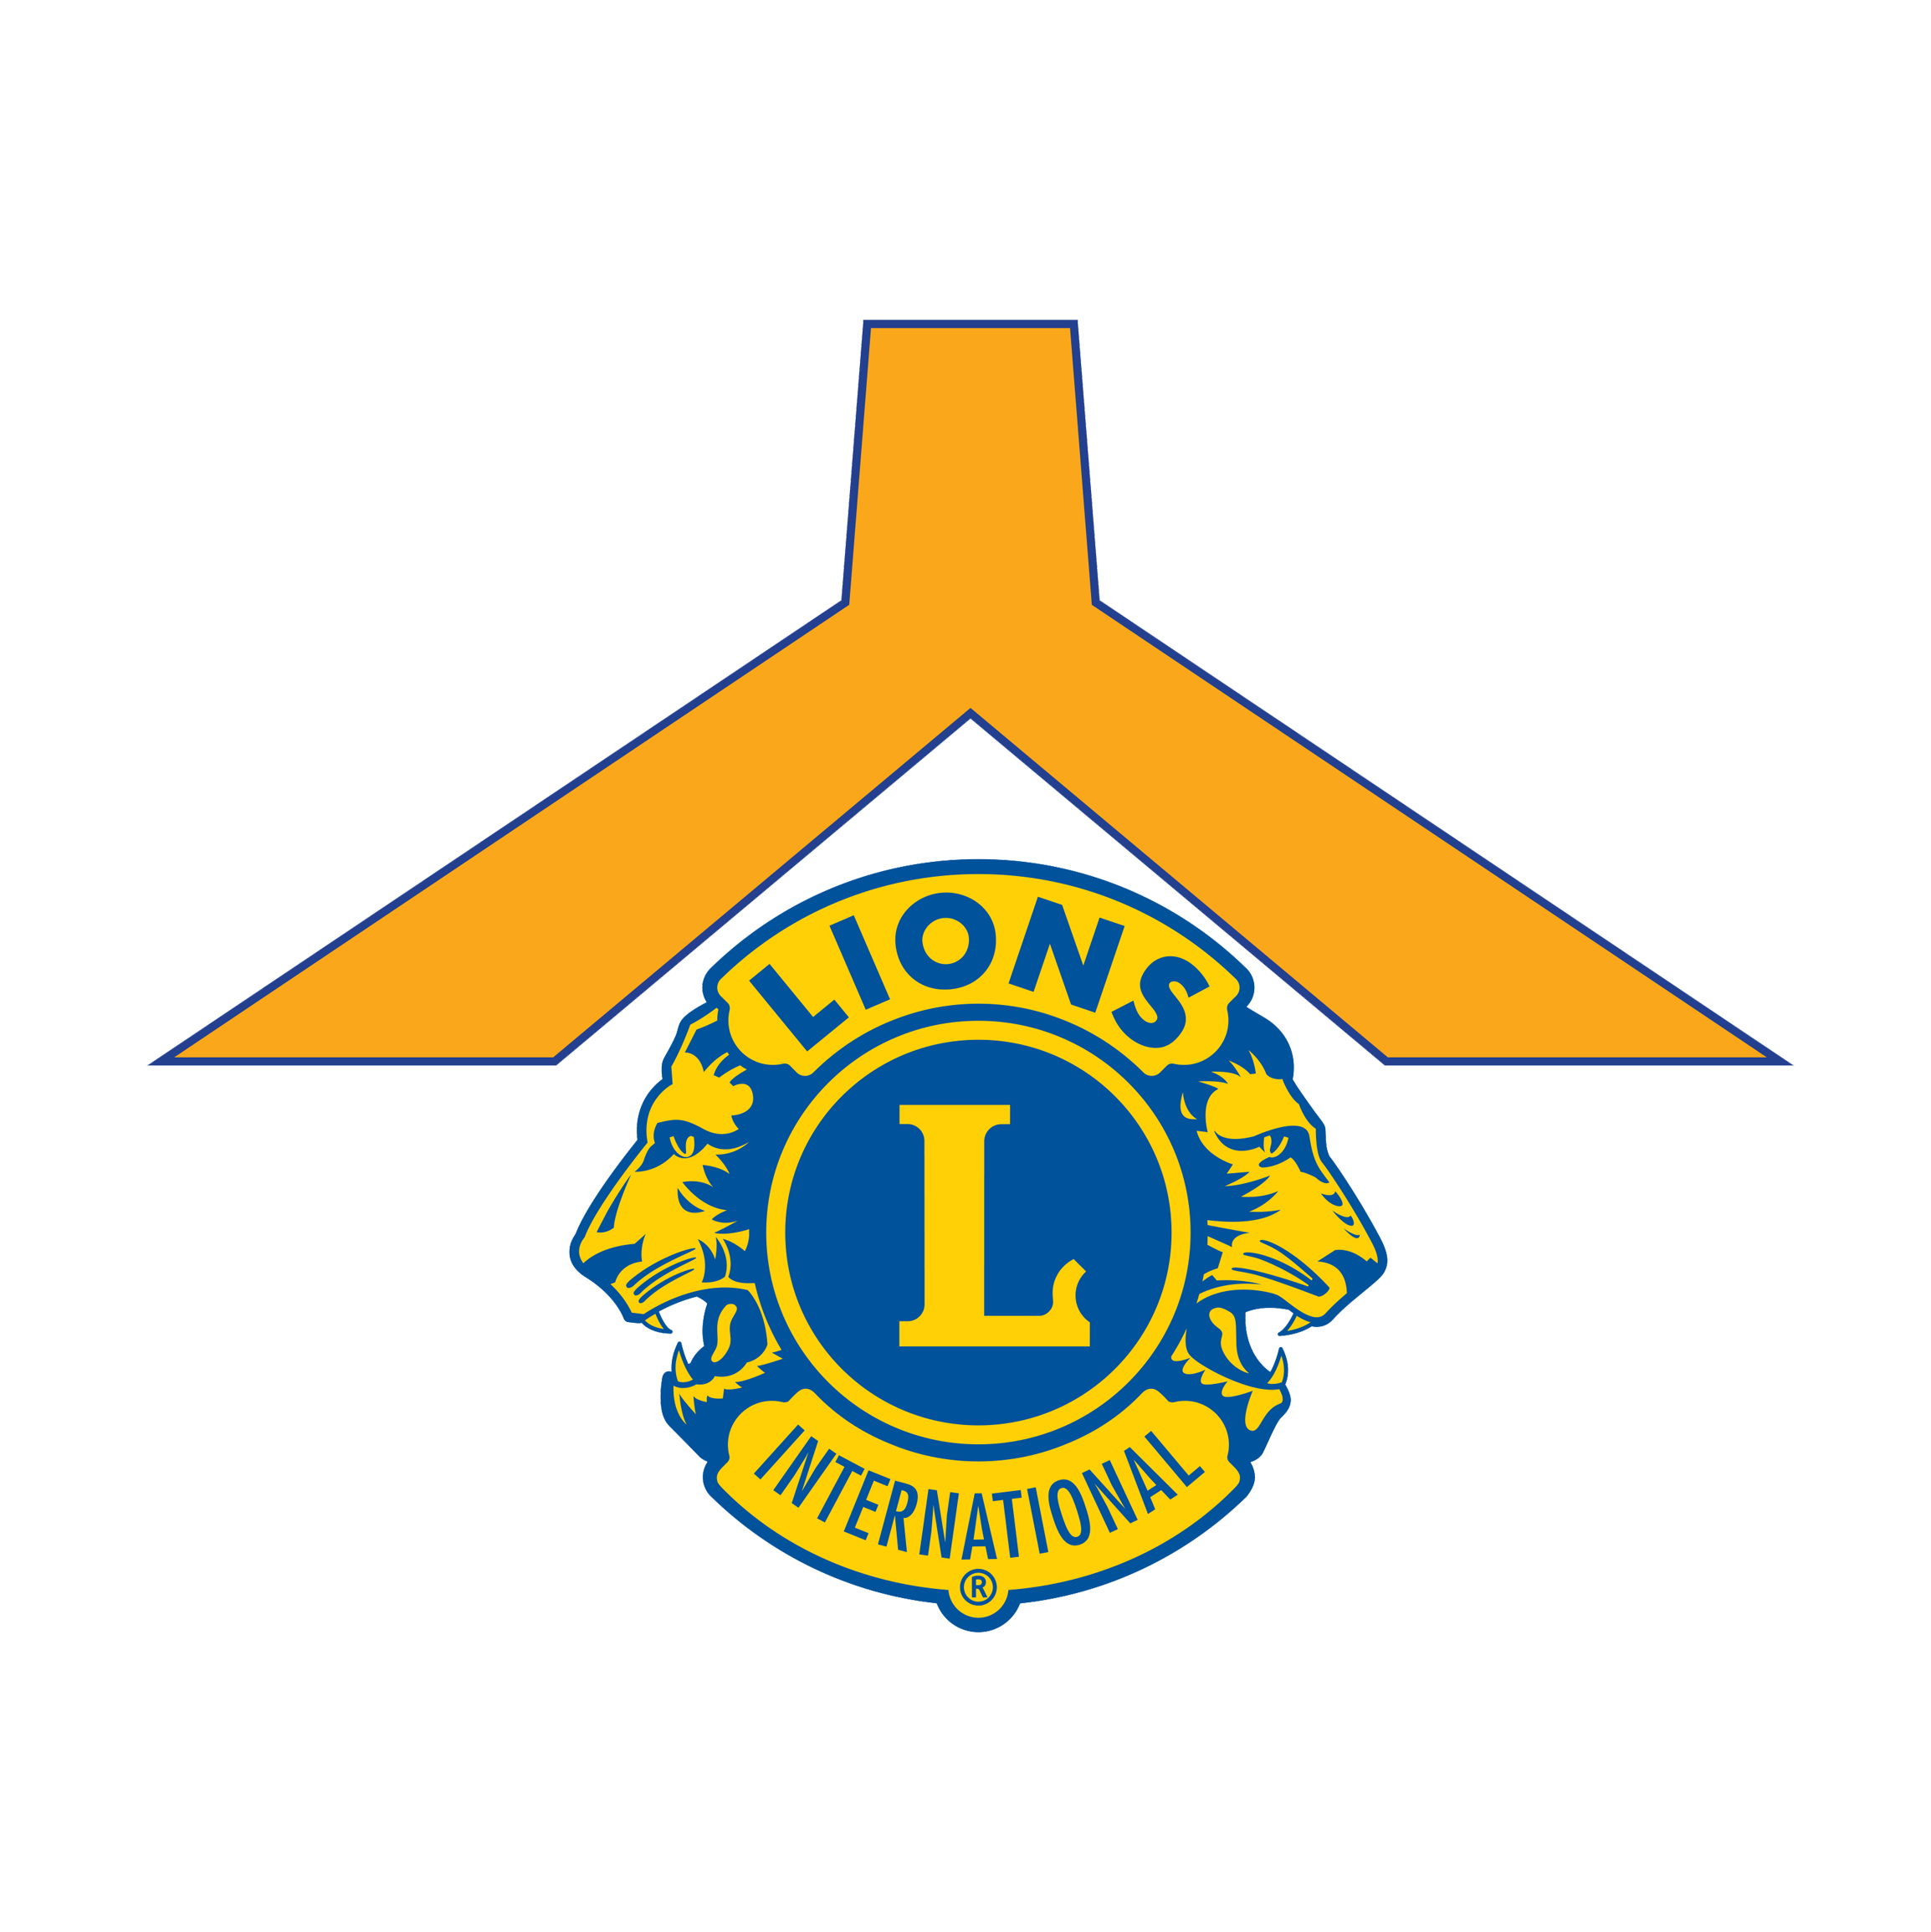 Yayasan Lions Indonesia